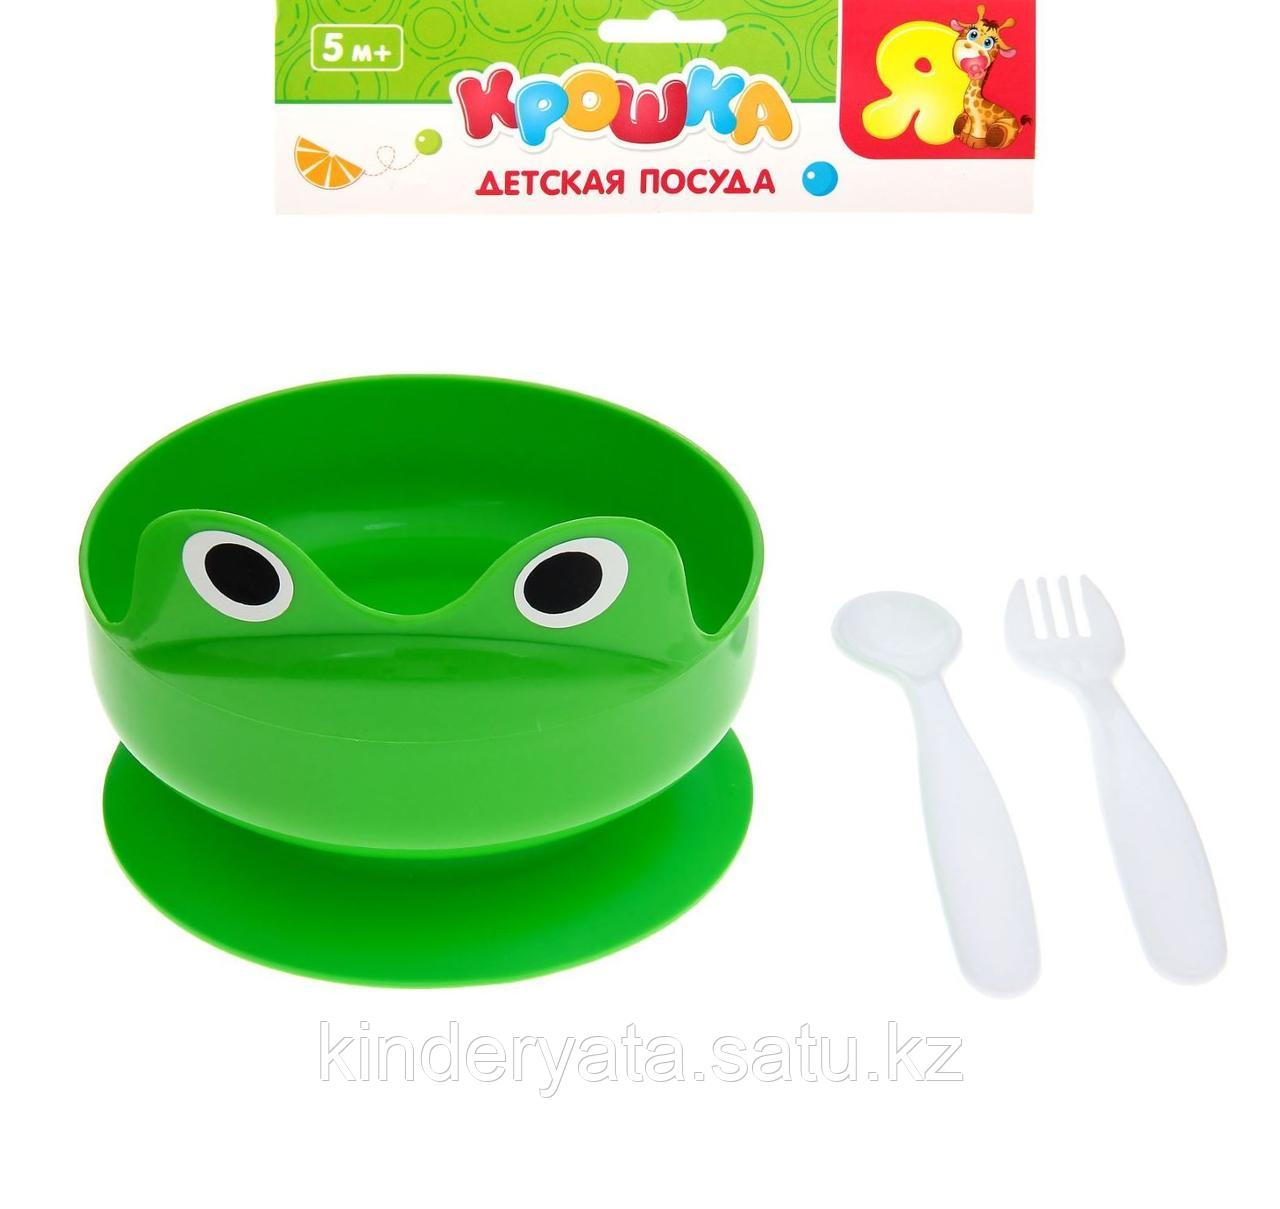 Набор детской посуды «Лягушка», 3 предмета: тарелка на присоске 300 мл, ложка, вилка